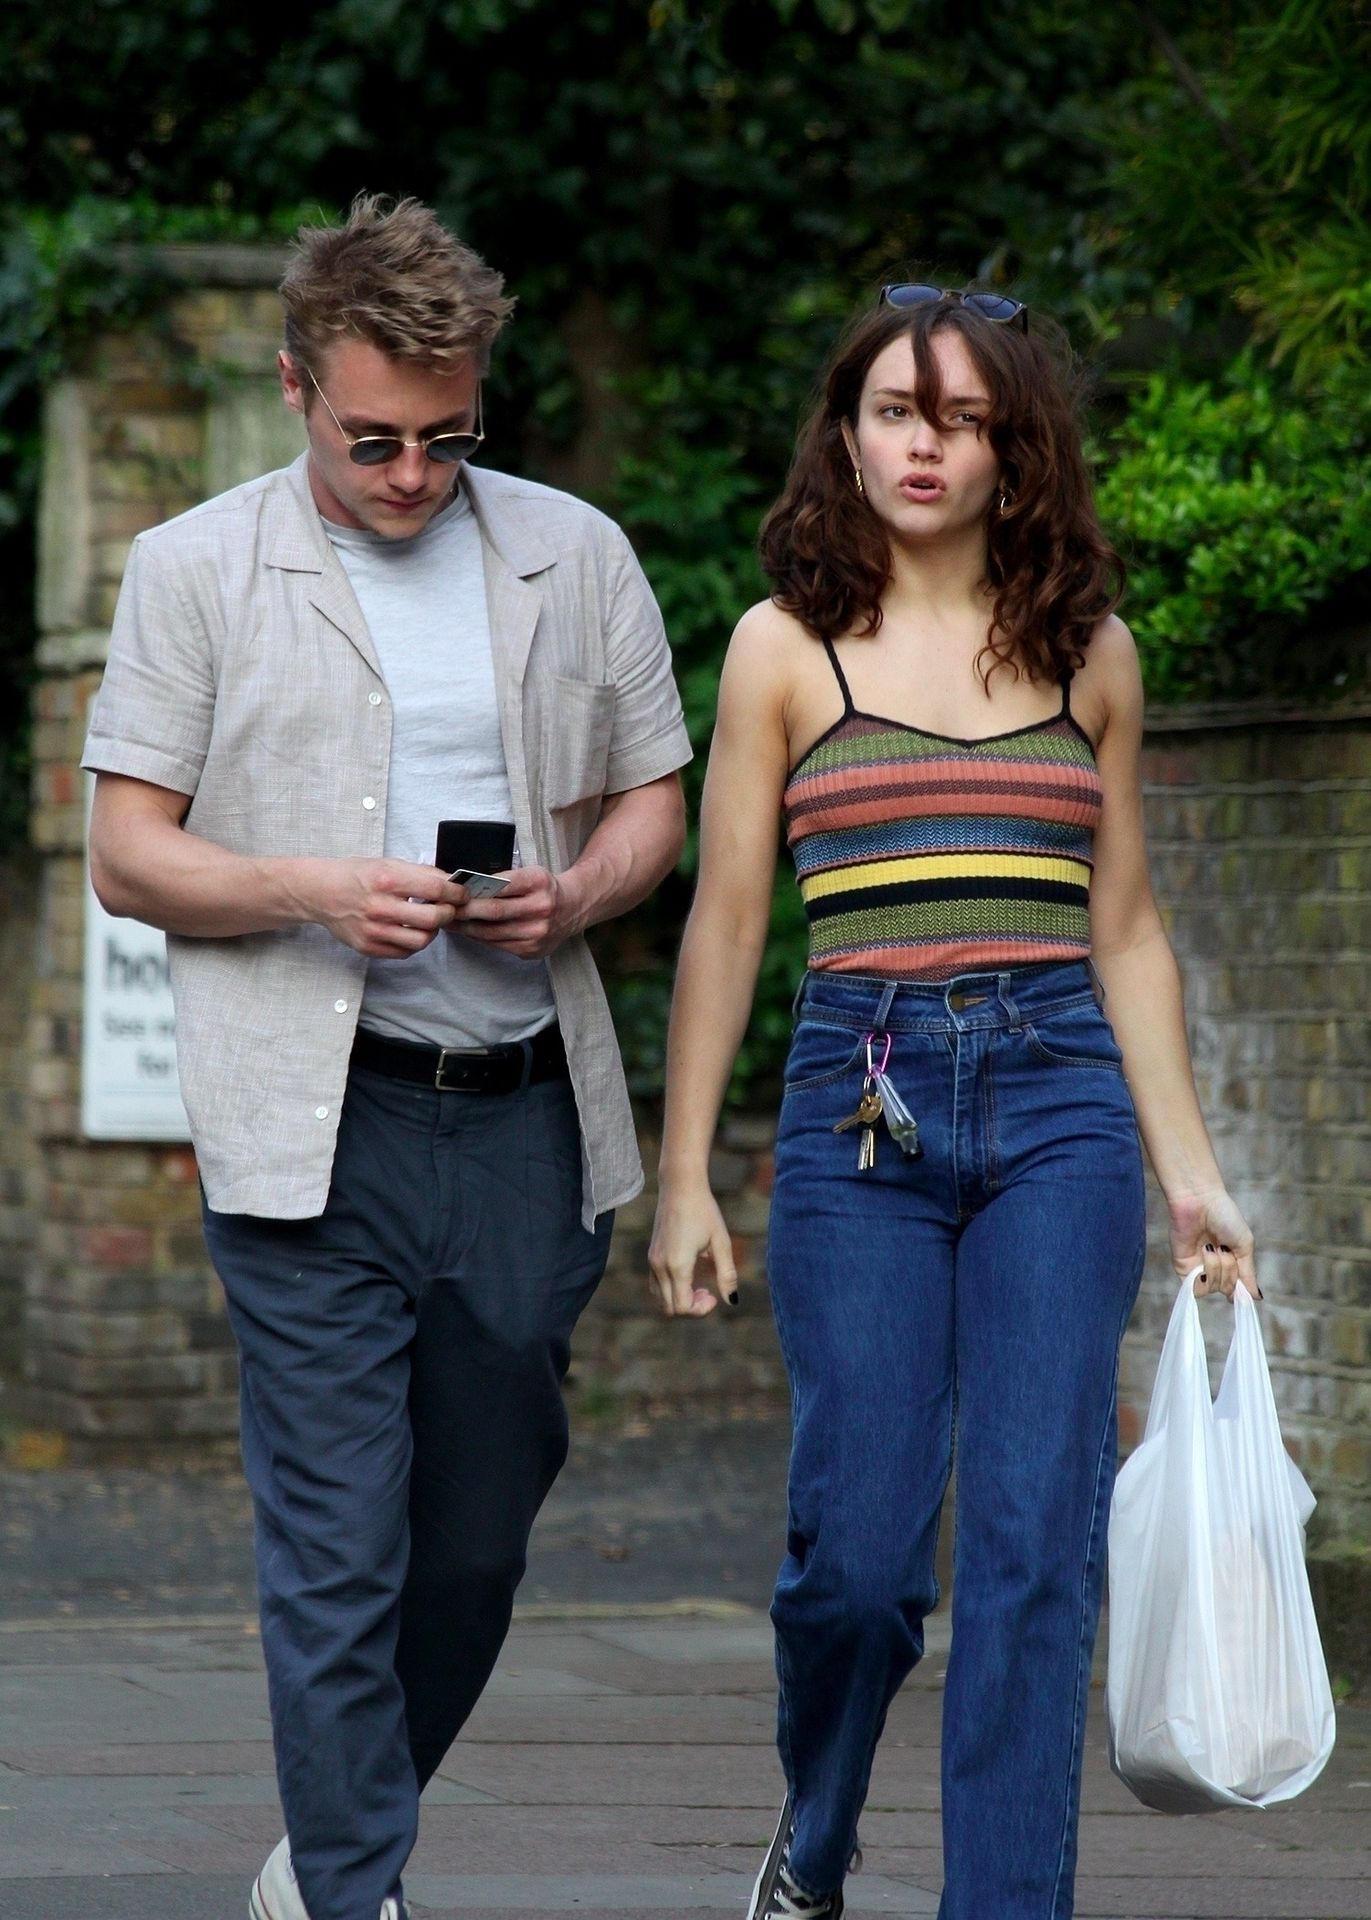 Ben Hardy Walks Hand In Hand With Actress Girlfriend Olivia Cooke 0009